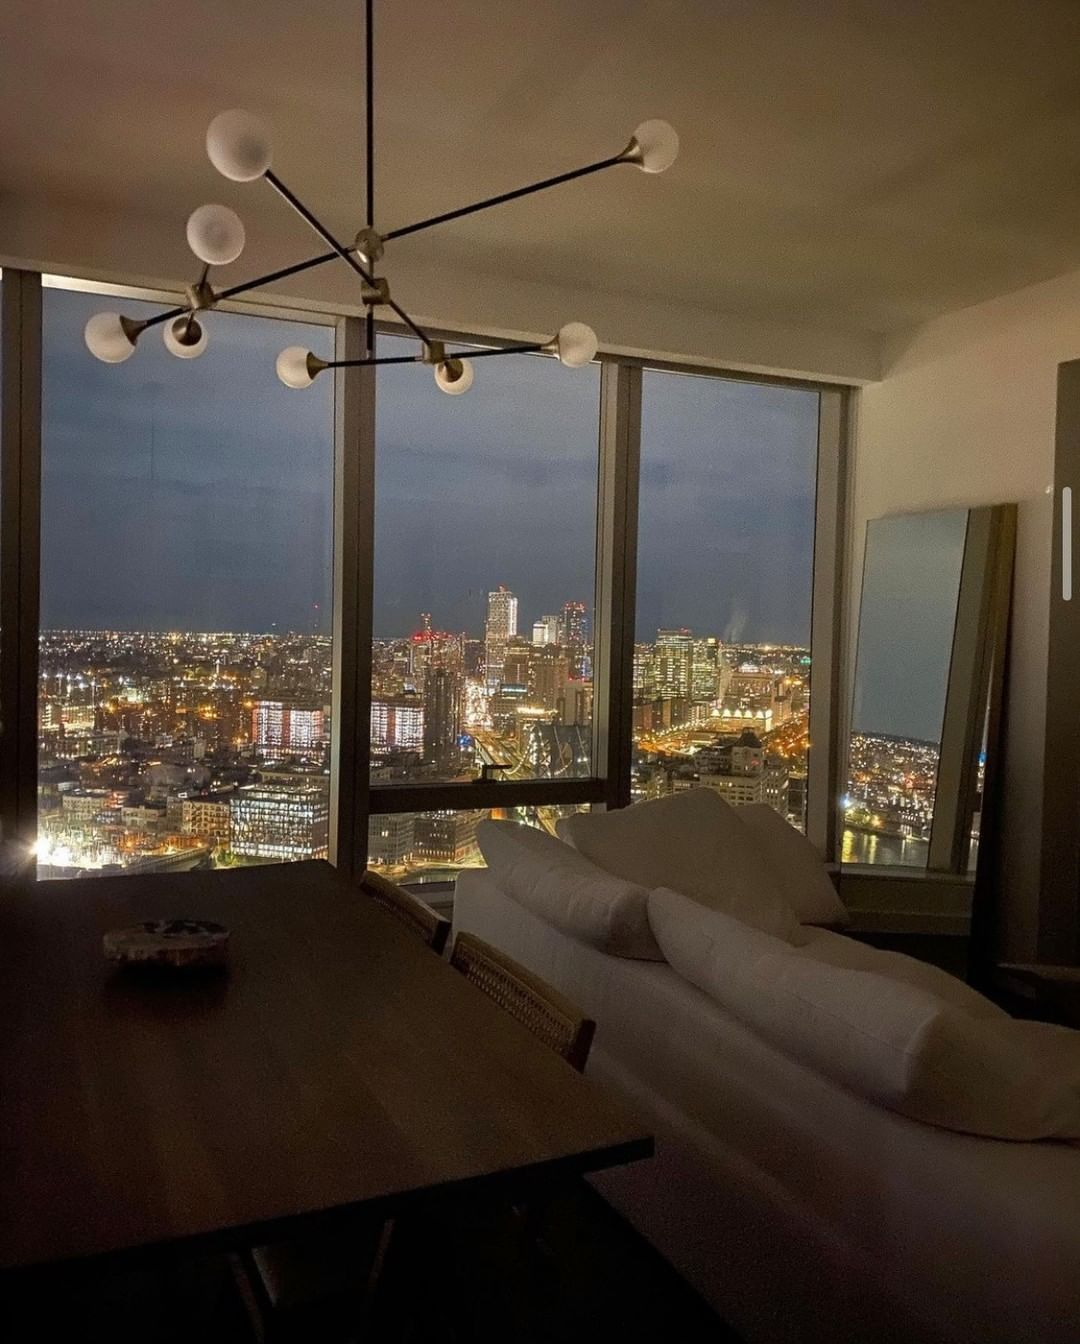 Real Nyc Apartments On Instagram Stunning City Views Cassdimicco Nyc Newyork Newyorkcity Ny Man In 2021 Dream Apartment Apartment View My Dream Home